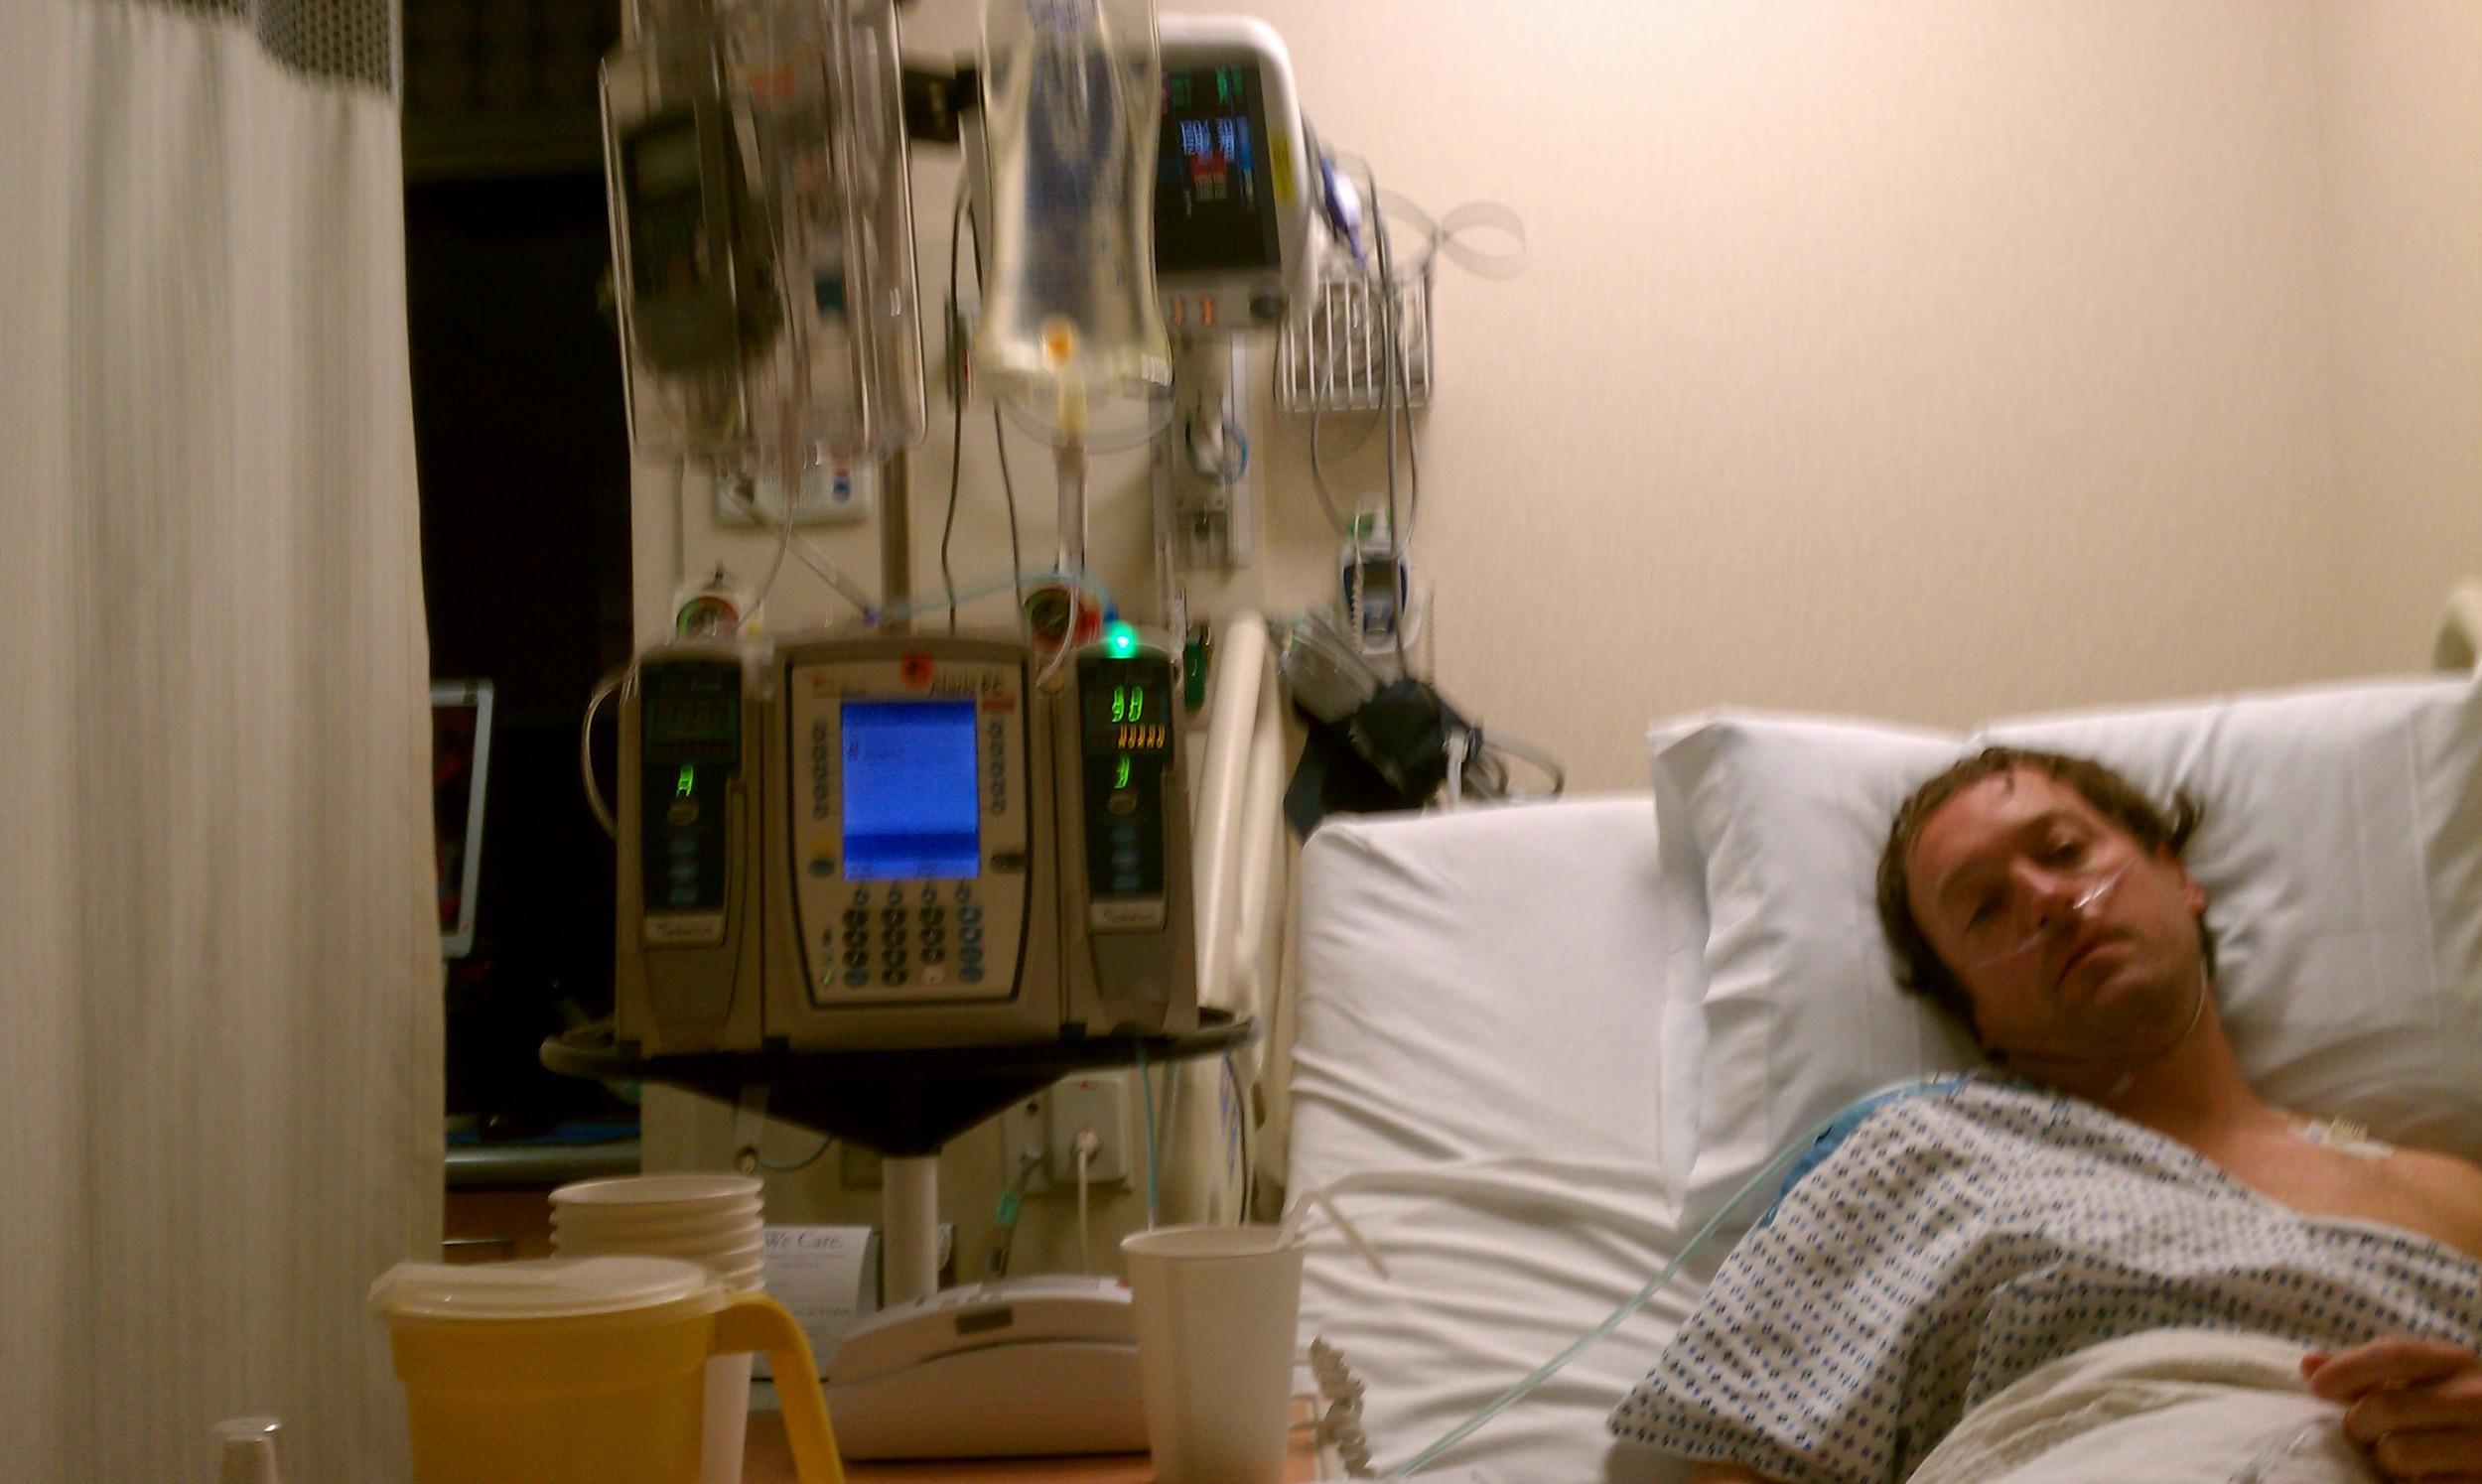 pierce-mcmanus-post-surgery-November2011.jpg